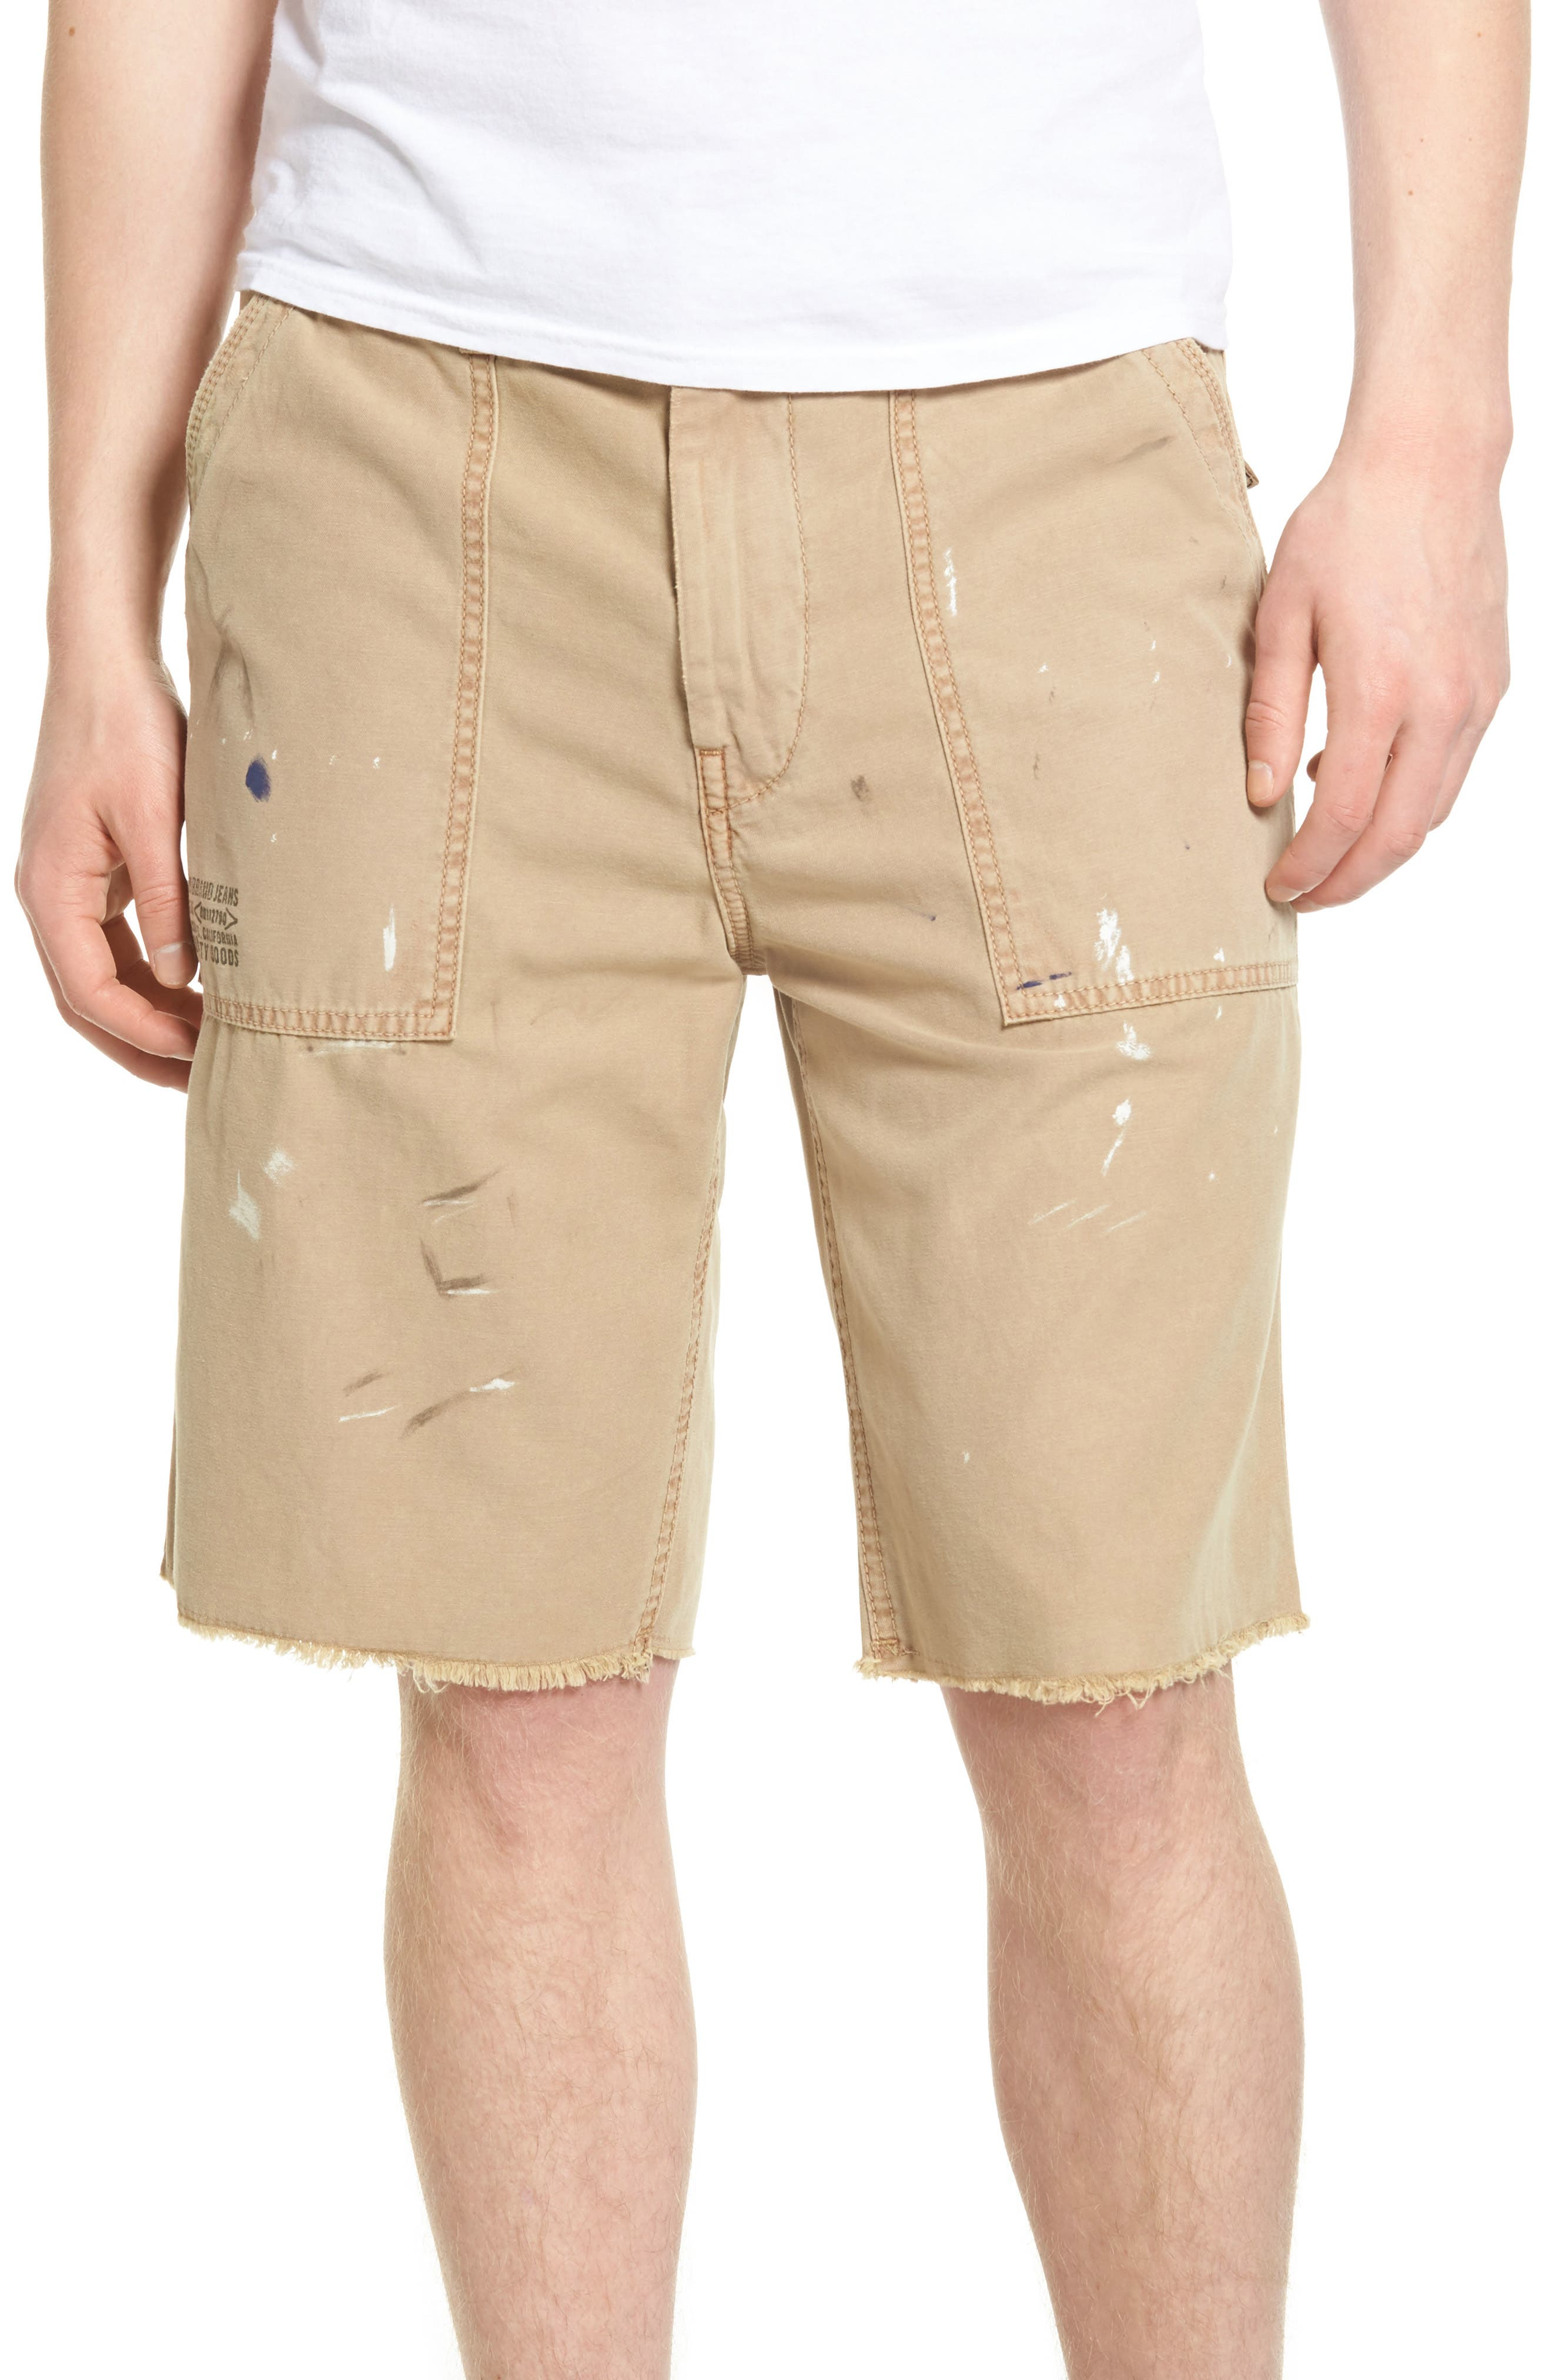 True Religion Brand Jeans Utility Surplus Shorts